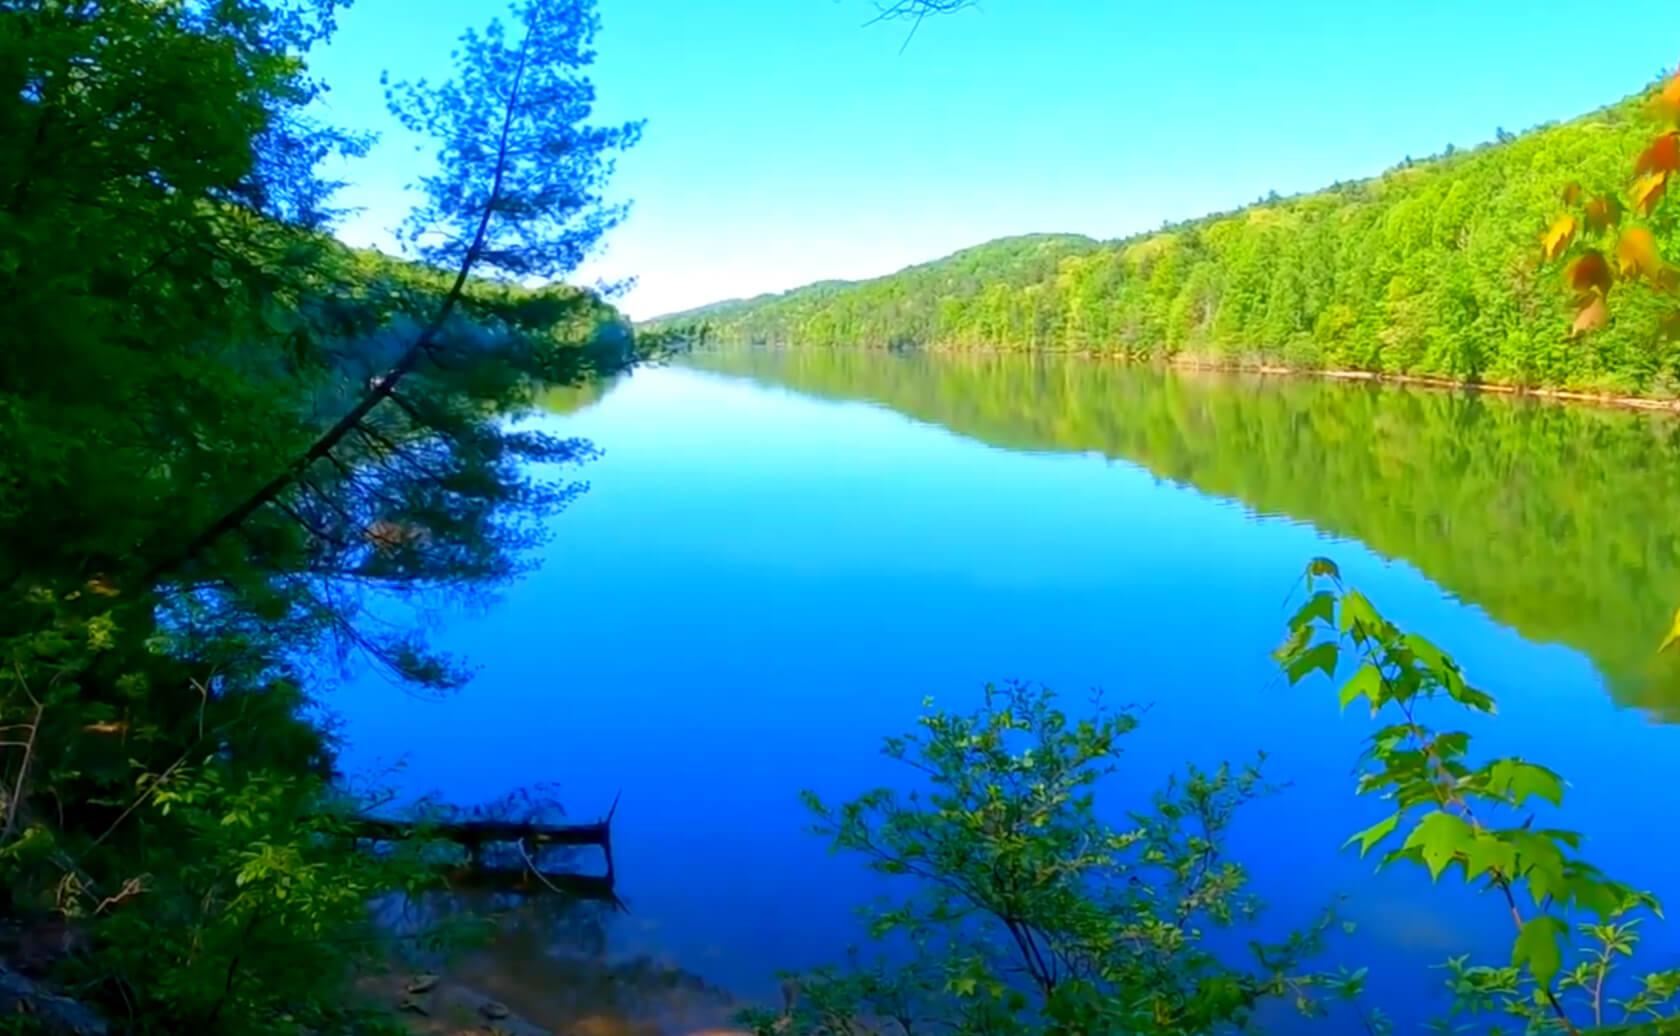 Jocassee-Lake-Fishing-Guide-Report-South-Carolina-03